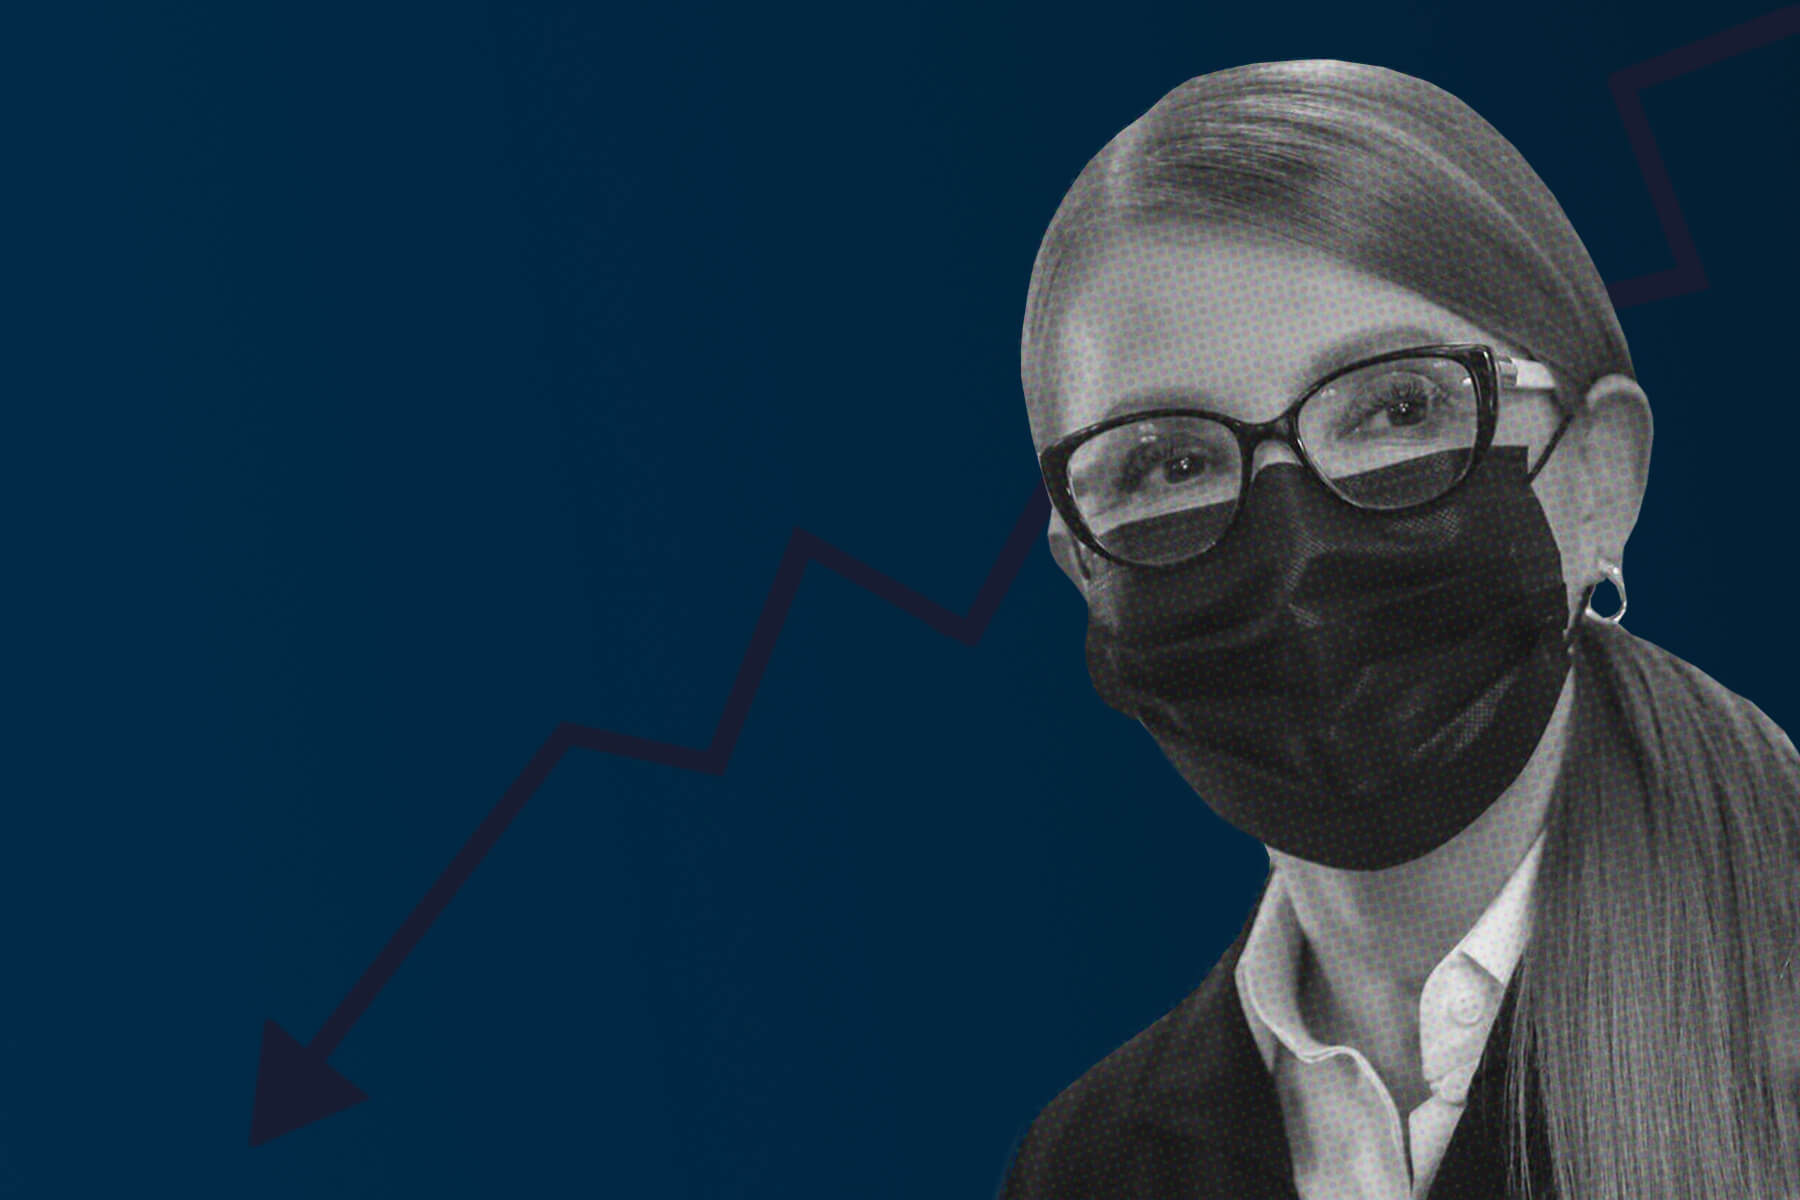 Tymoshenko, customs people, taxmen and minus 120 billion in revenue